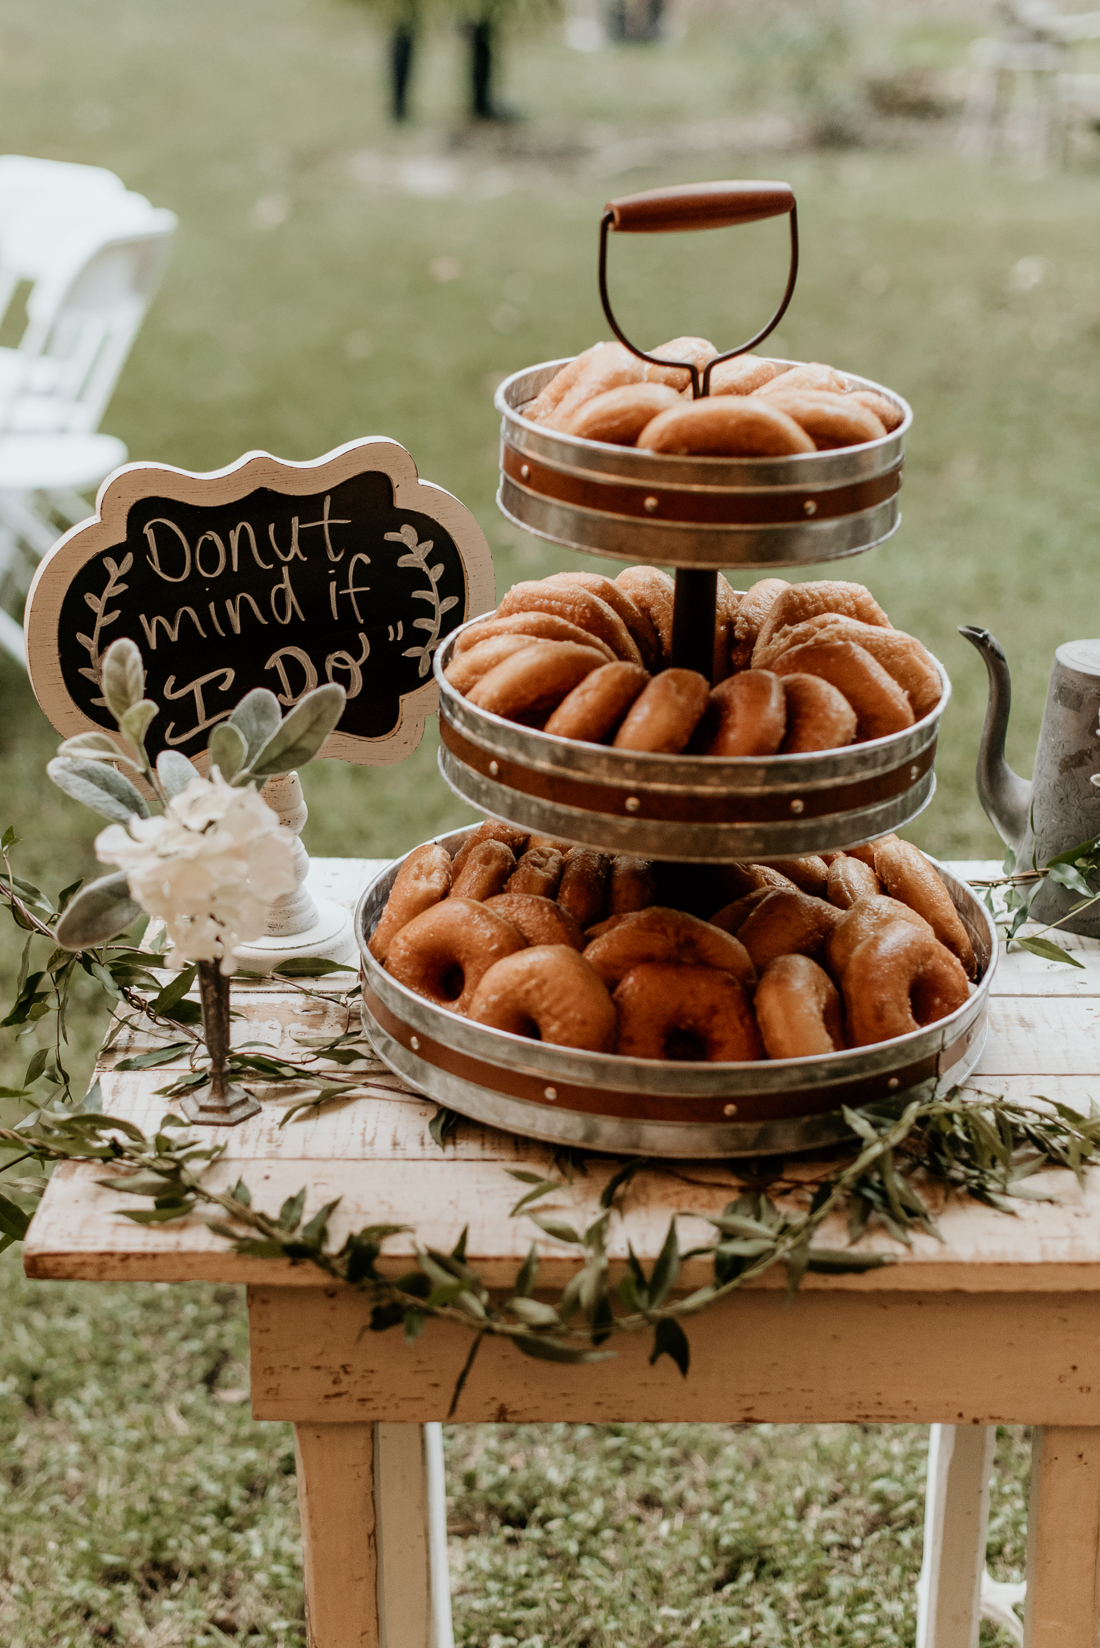 olivia_zay_wedding_09_2018-0676.jpg